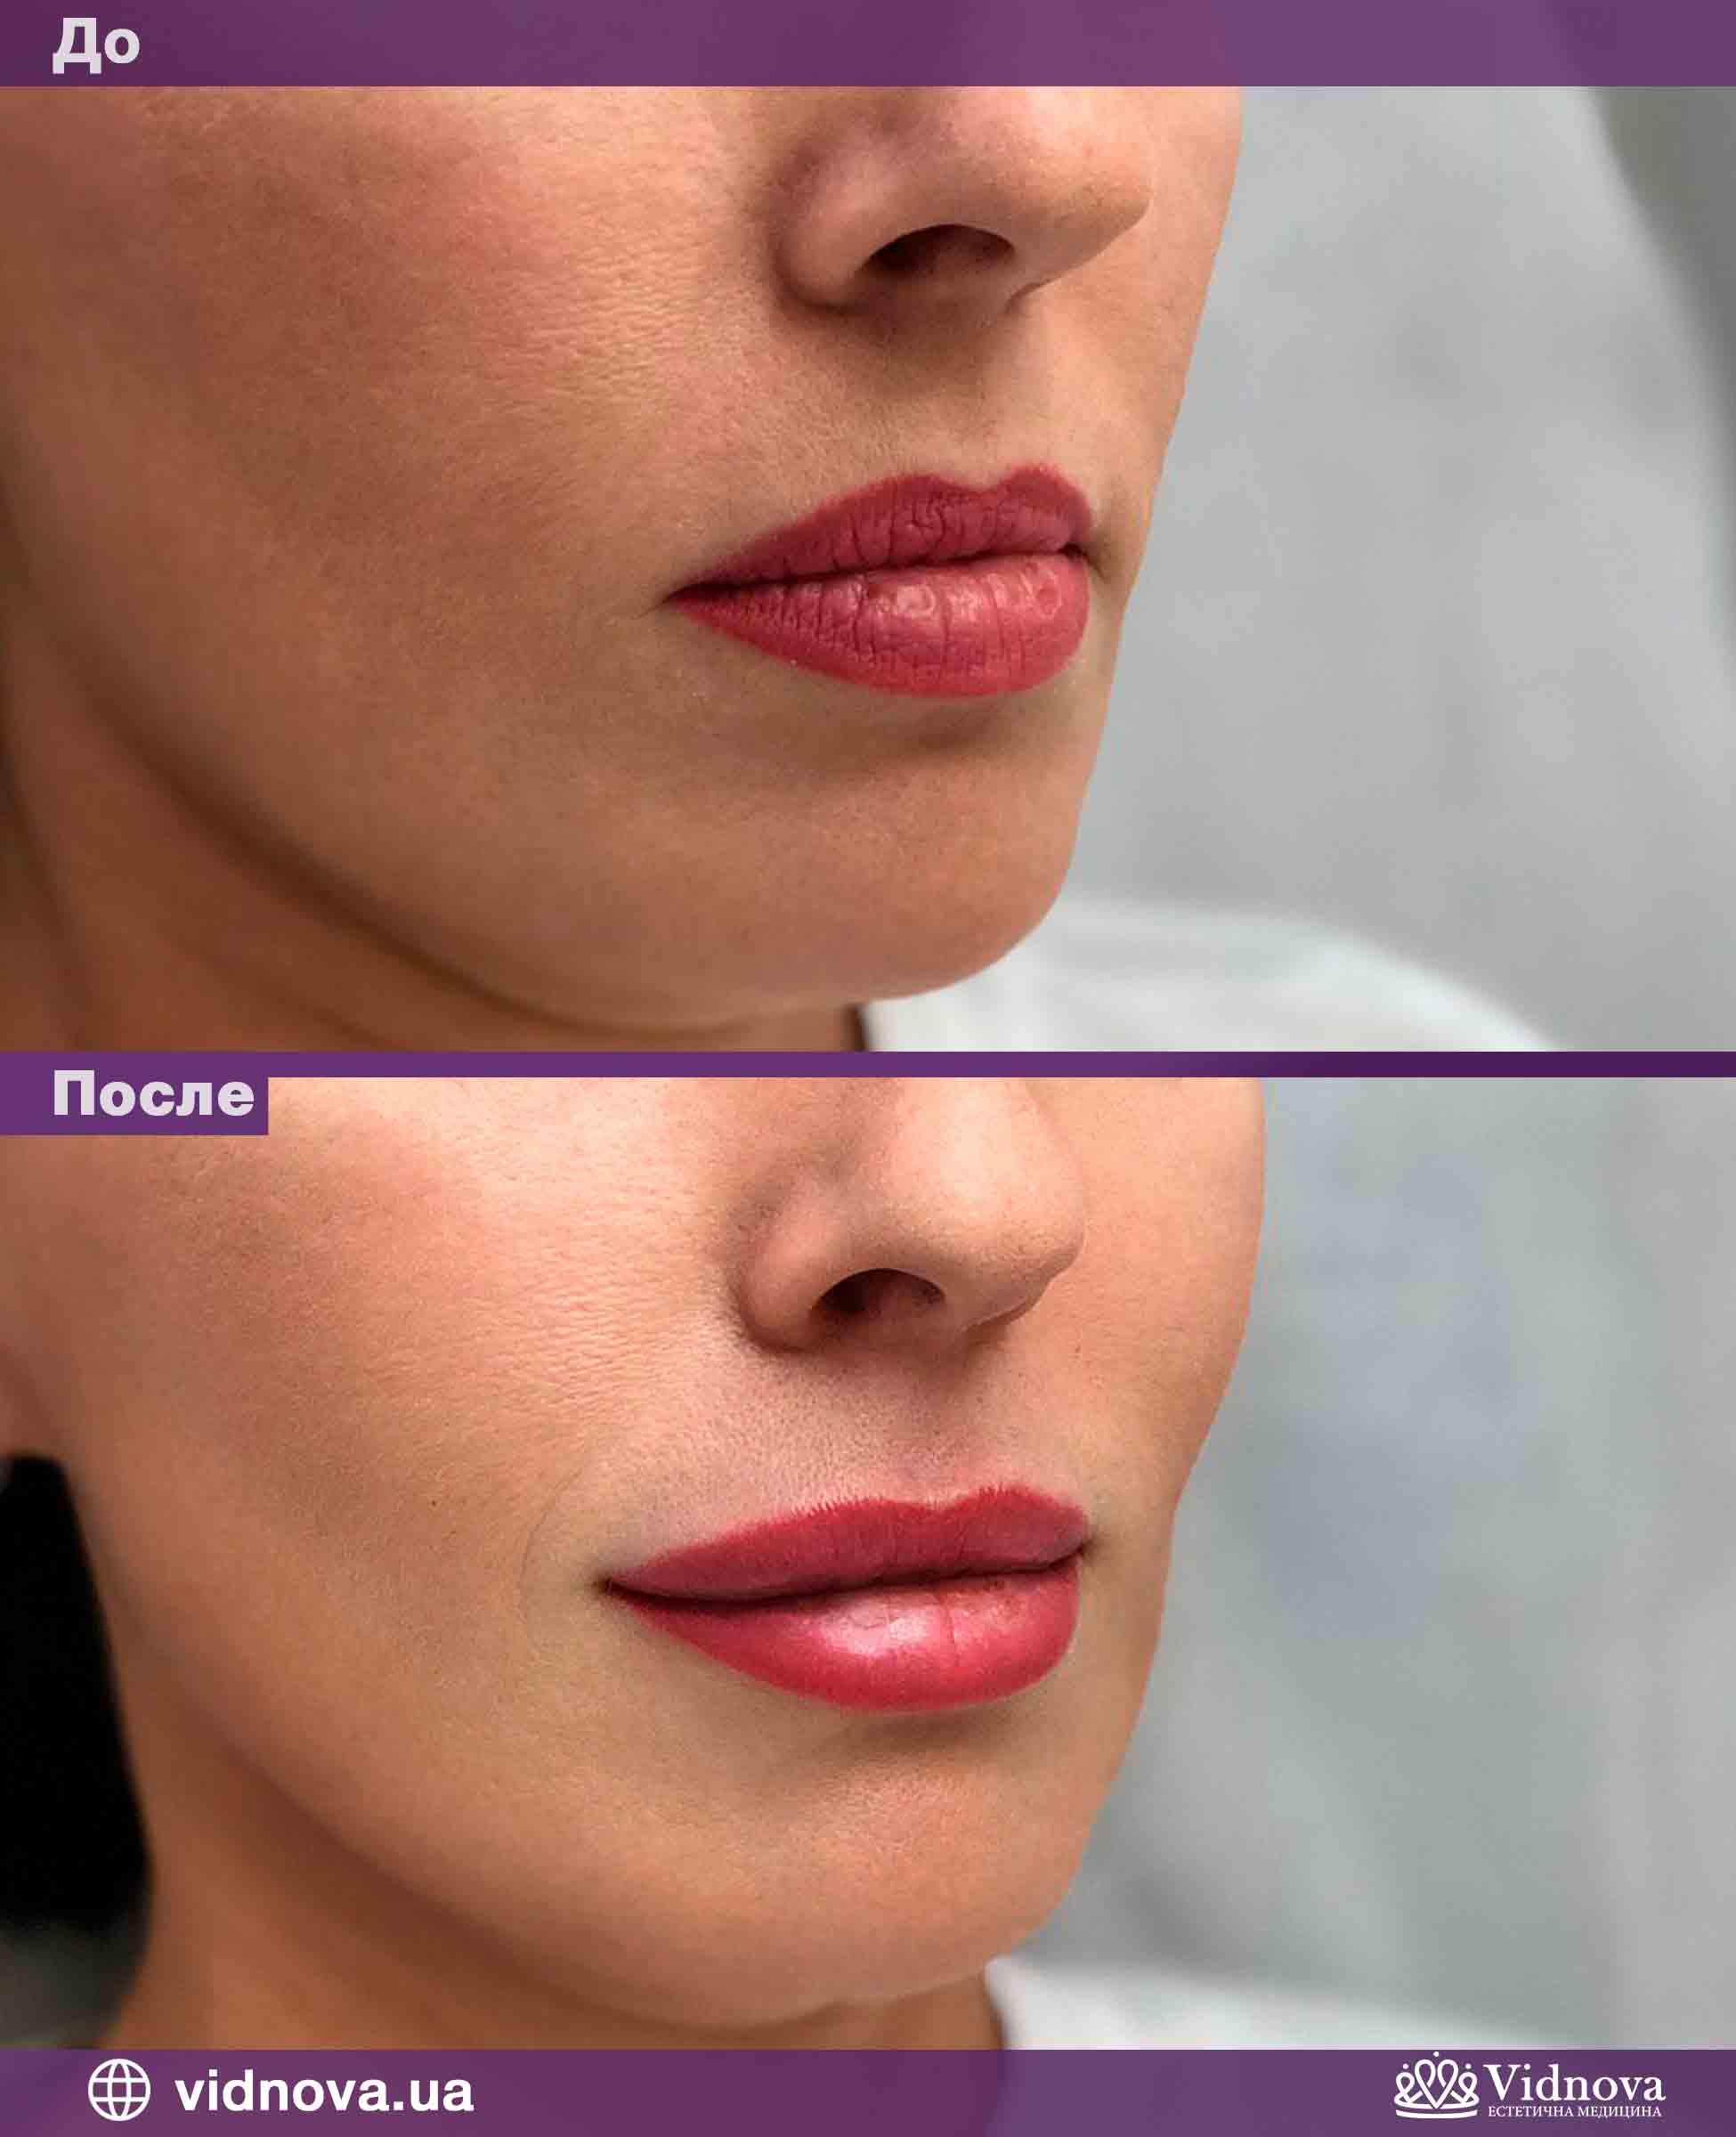 Увеличение губ: Фото До и После - Пример №3-2 - Клиника Vidnova